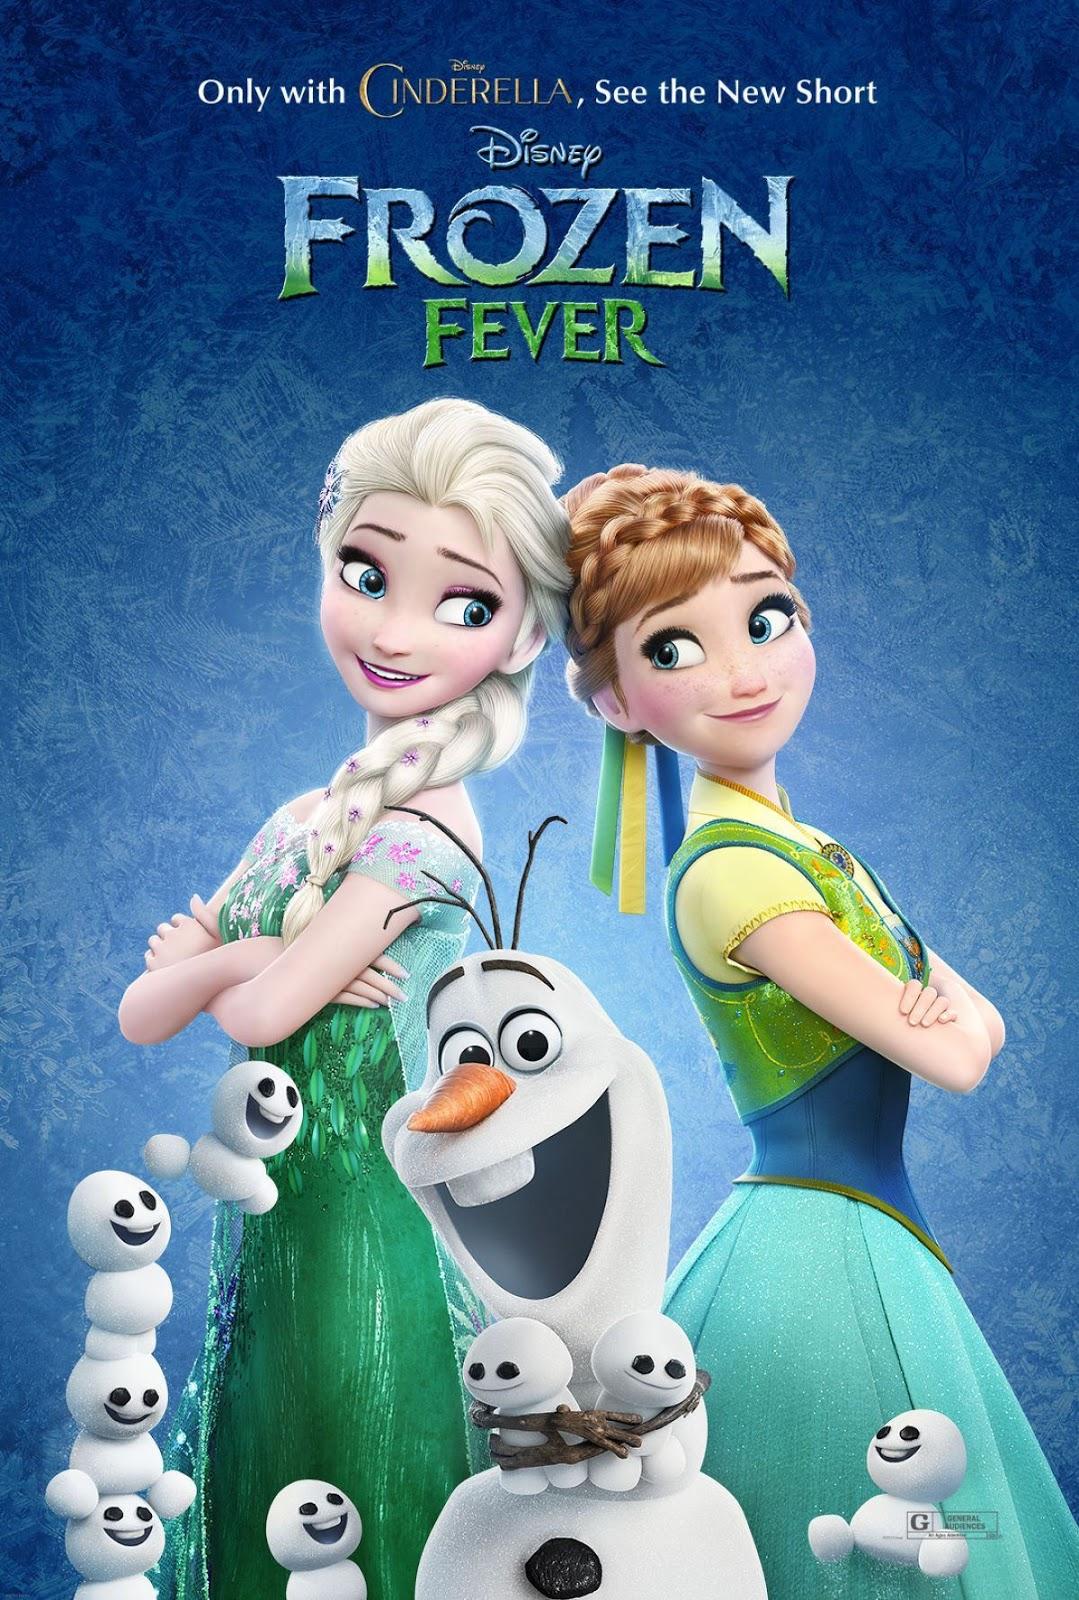 Frozen Fever (2015) โฟรเซ่น ฟีเวอร์ ตอนพิเศษ [HD][พากย์ไทย]